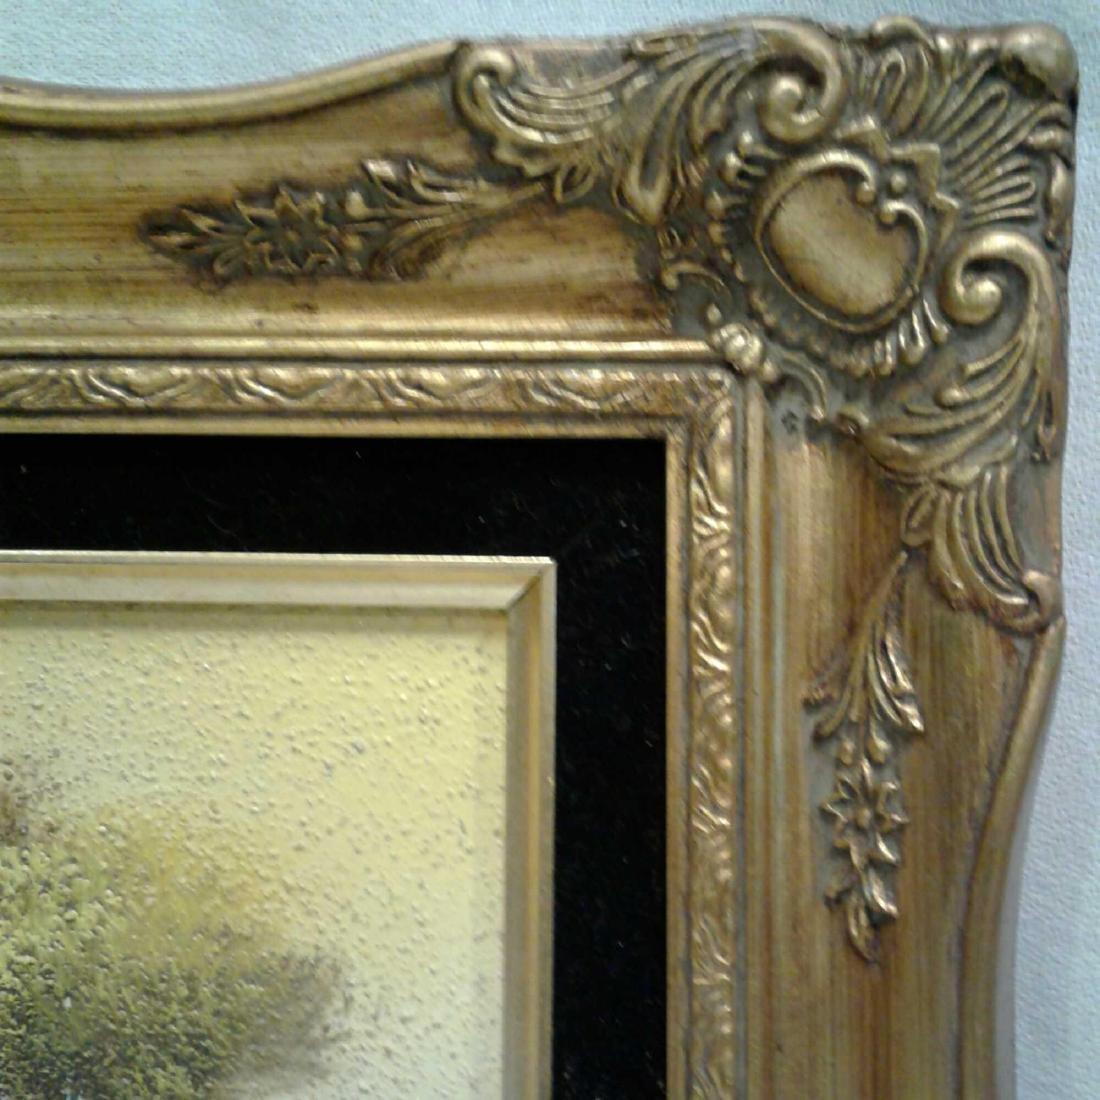 Sandy Grit Textured Impasto Oil Painting - 9